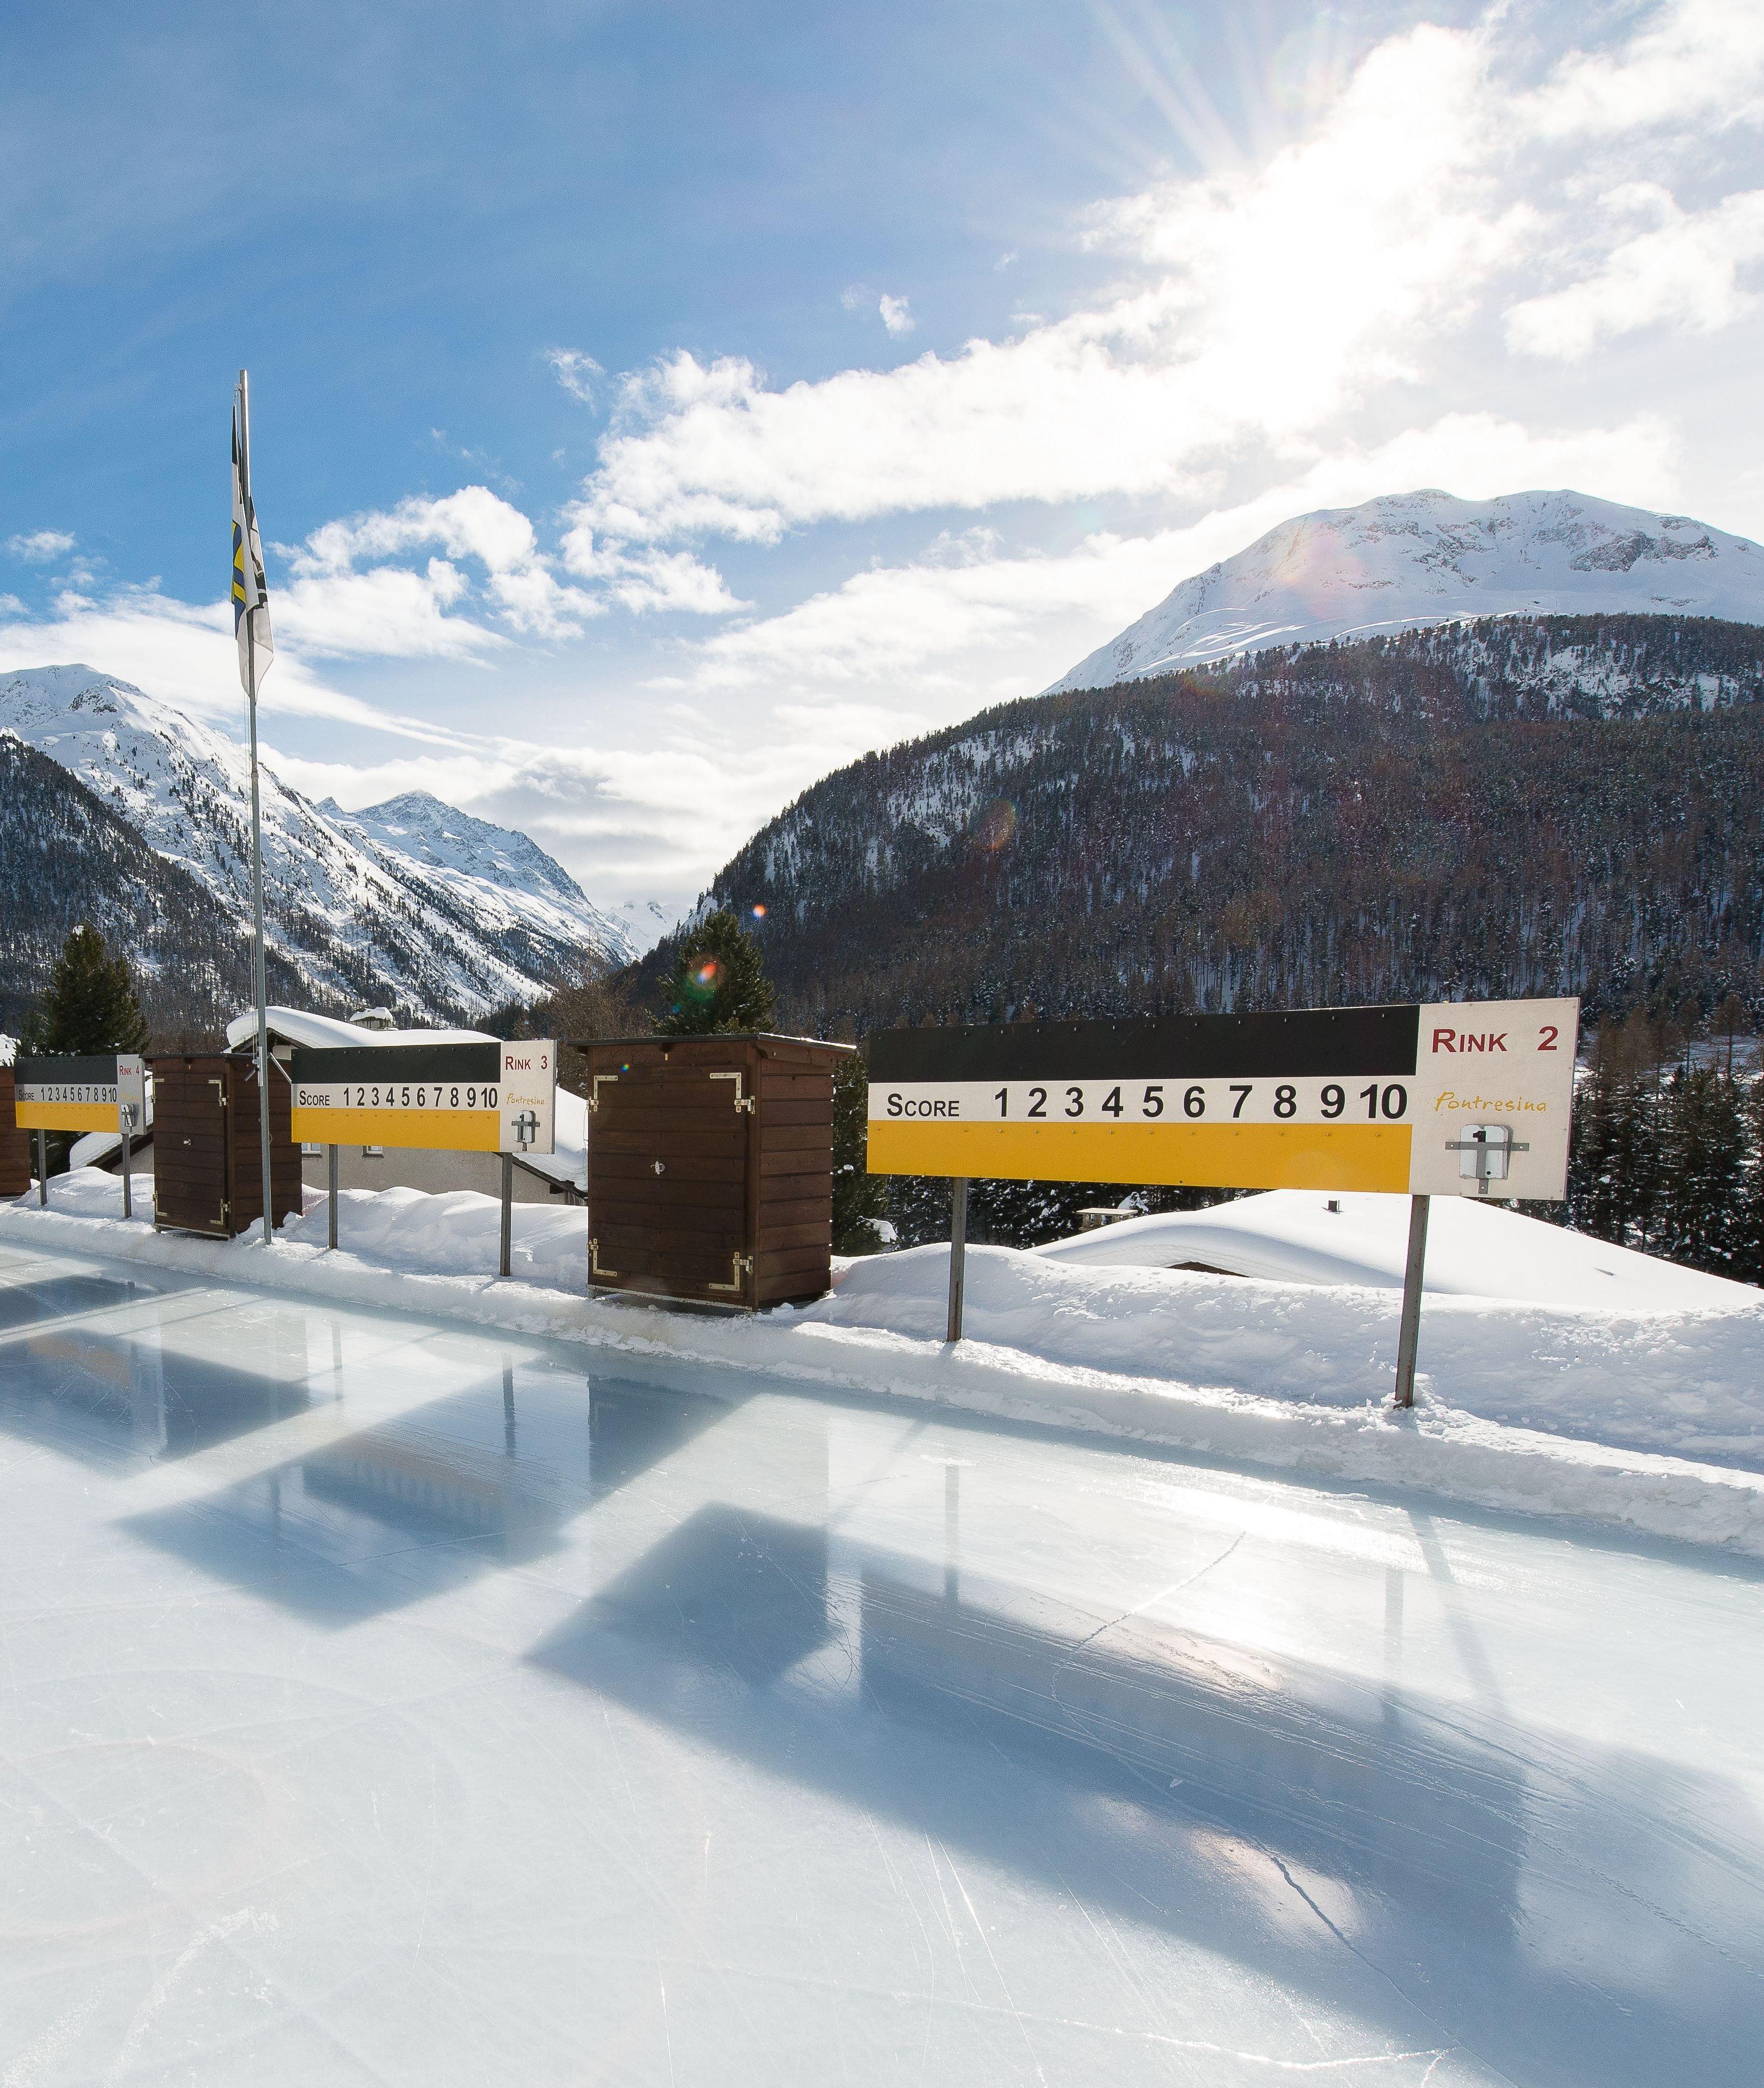 Eisplatz Roseg Pontresina Slide 1